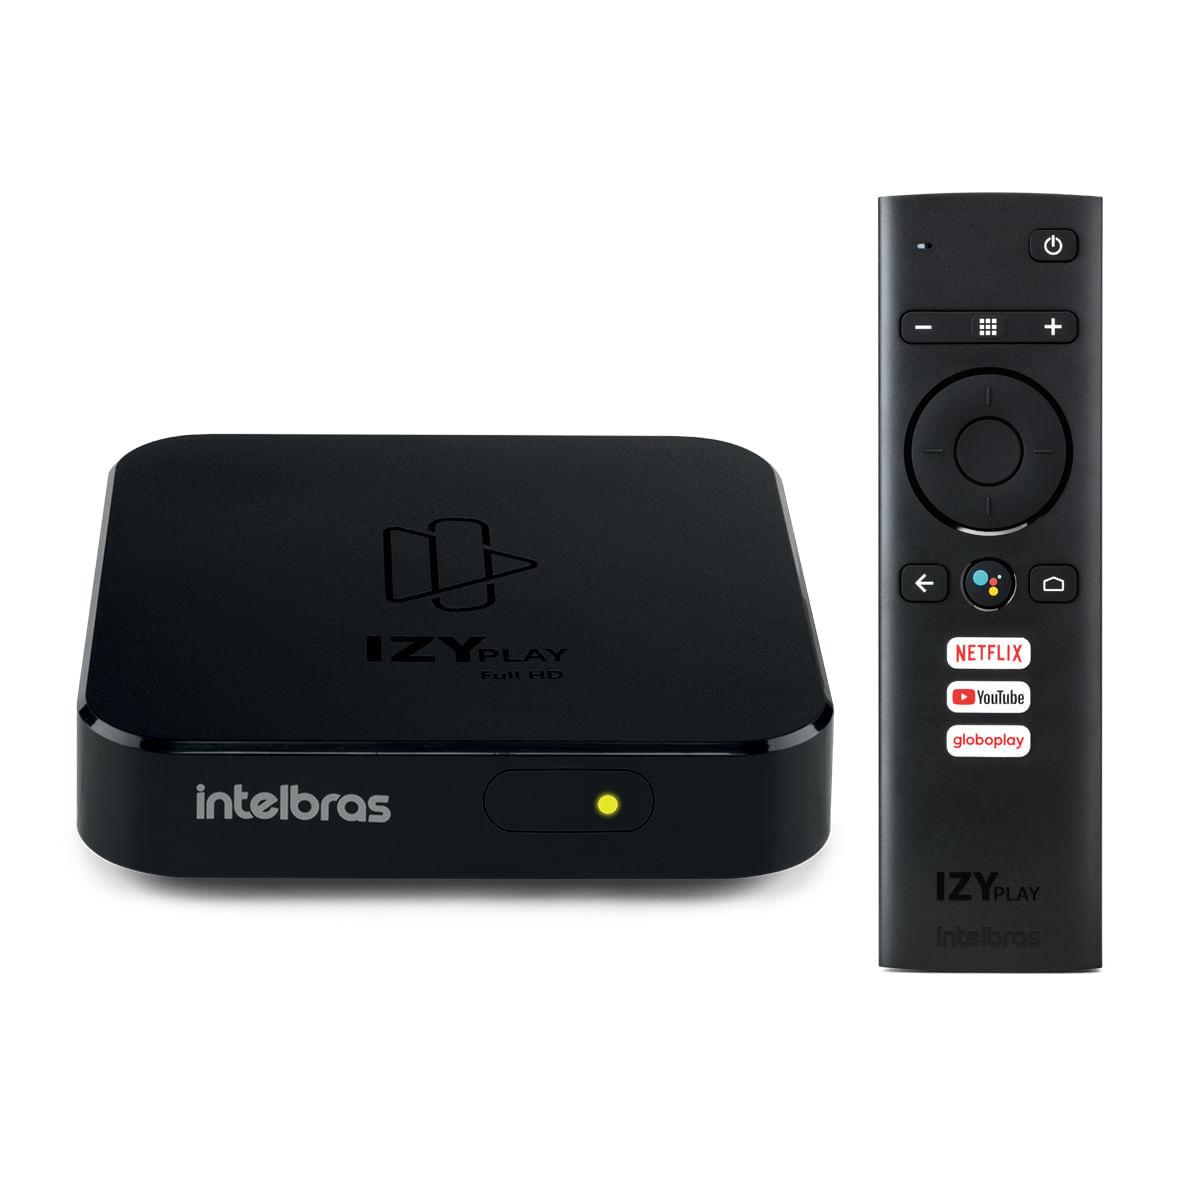 Smart Box Android TV Intelbras IZY Play com Globoplay